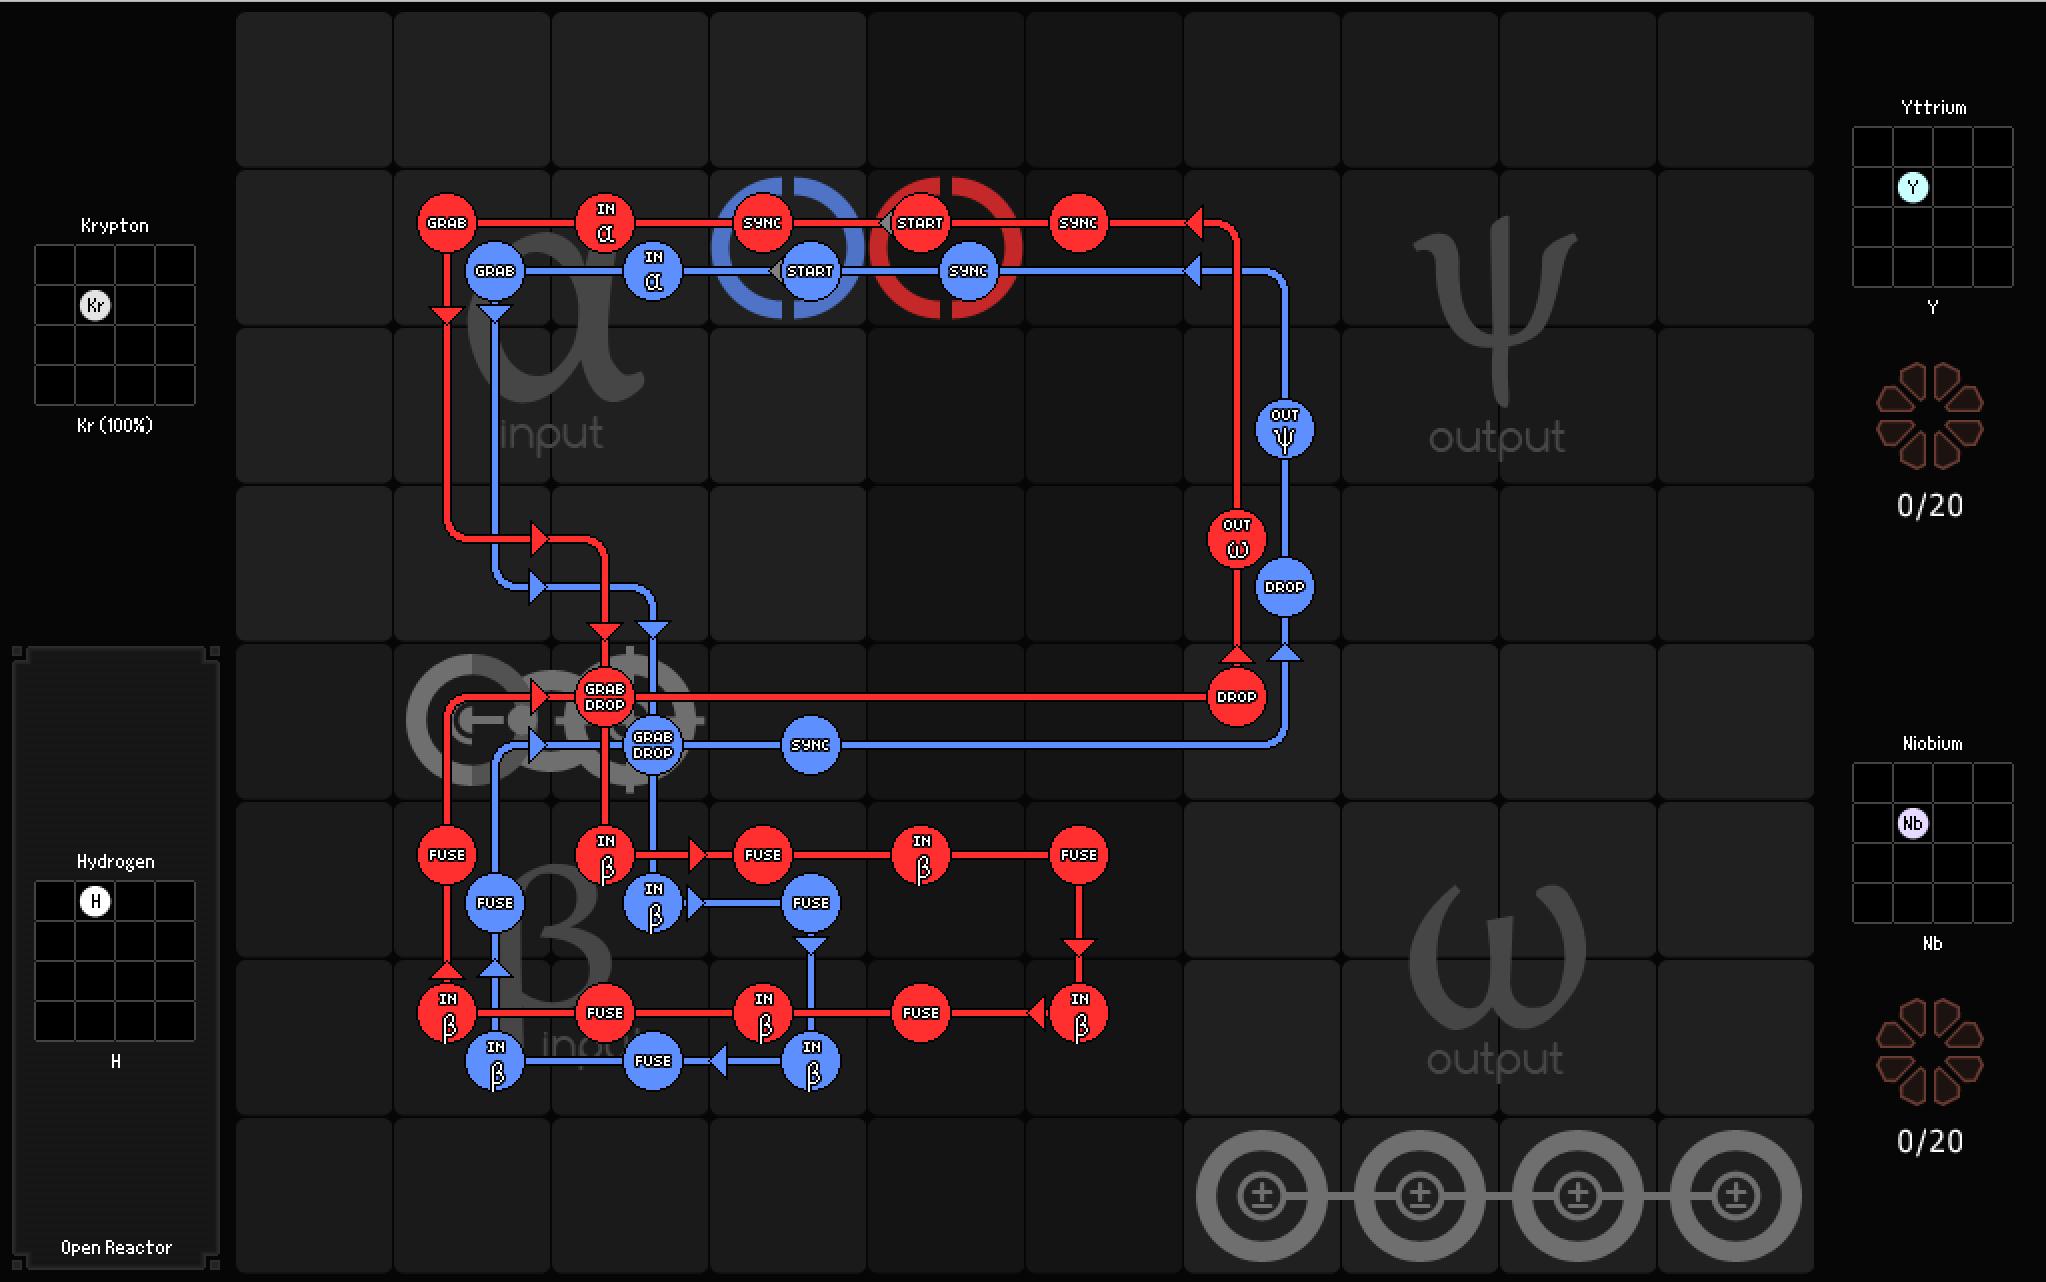 1_Story_Mode/5_Sikutar/SpaceChem-5.4.b/Reactor_2.png